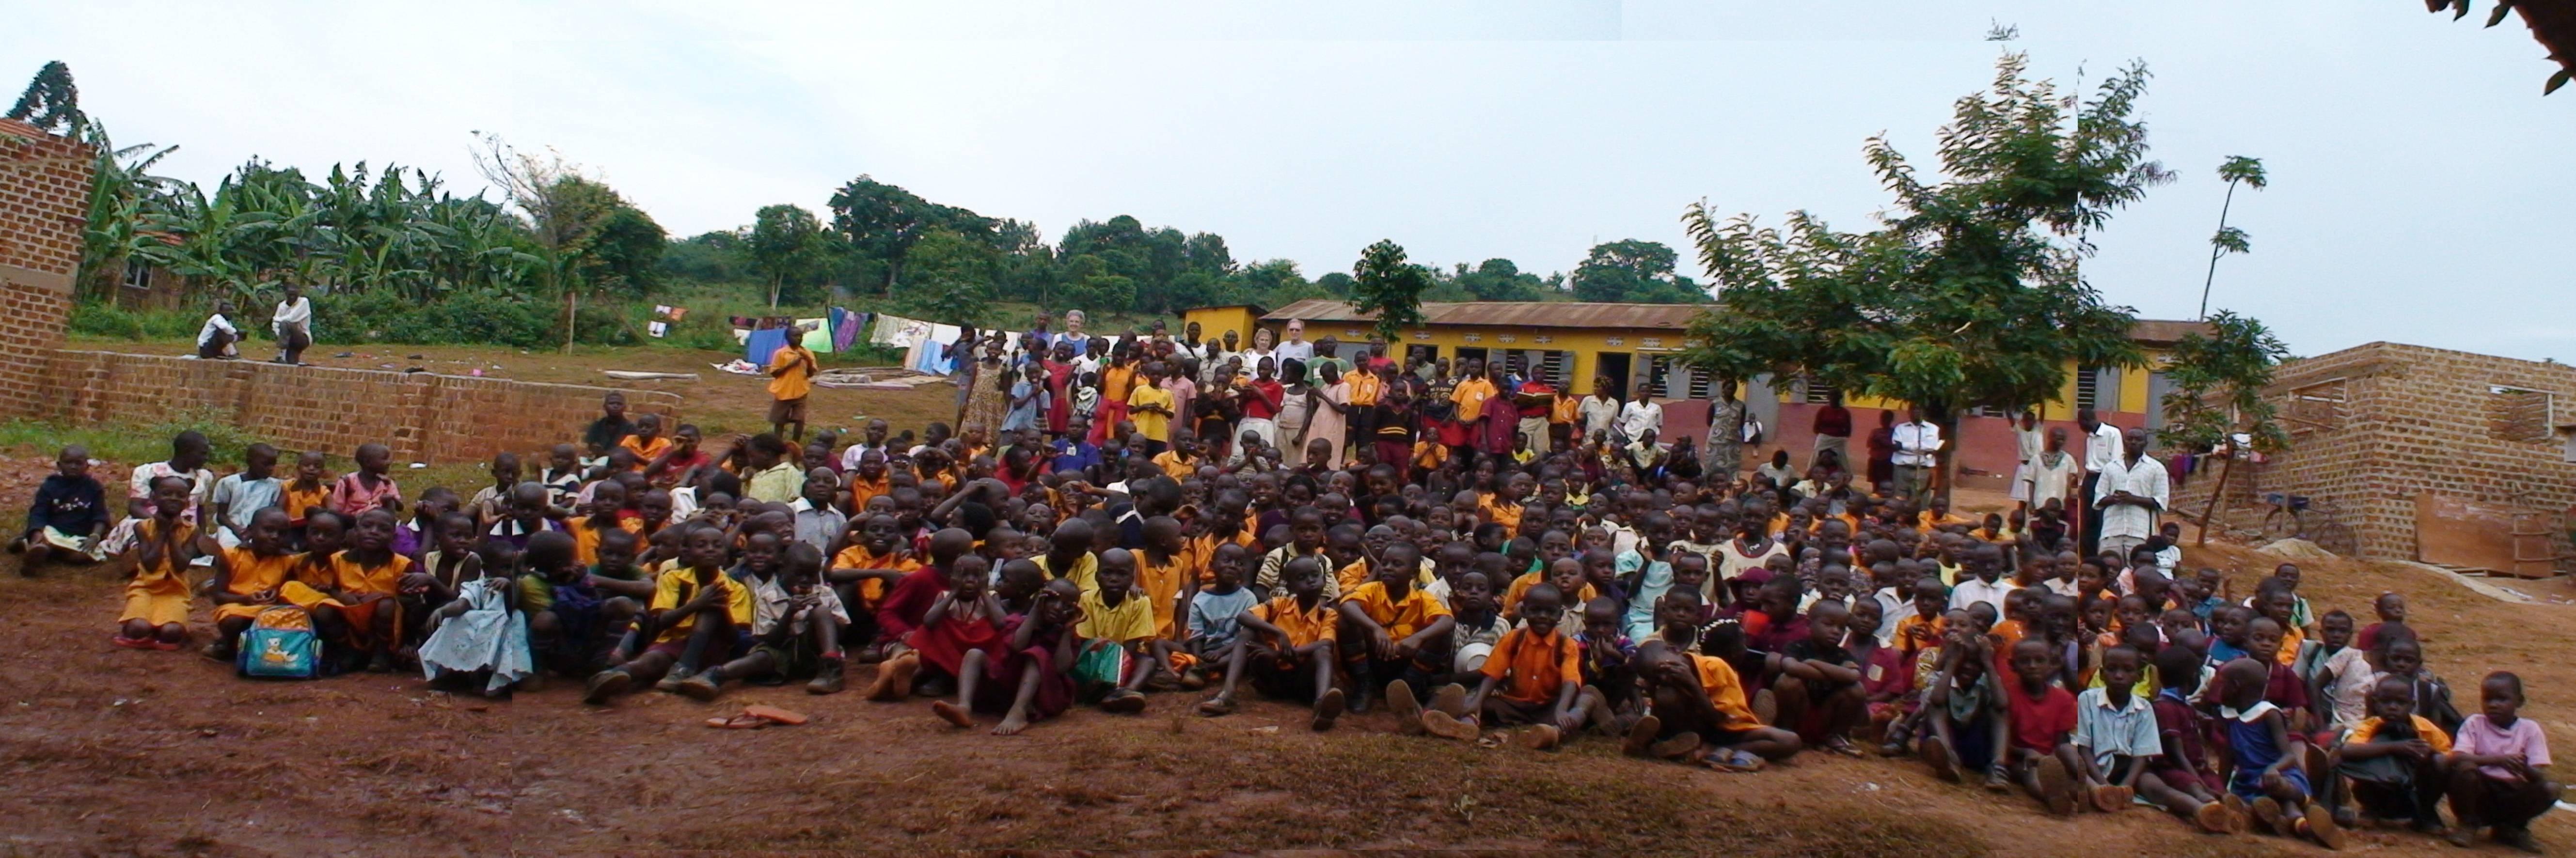 Mitumba School Children